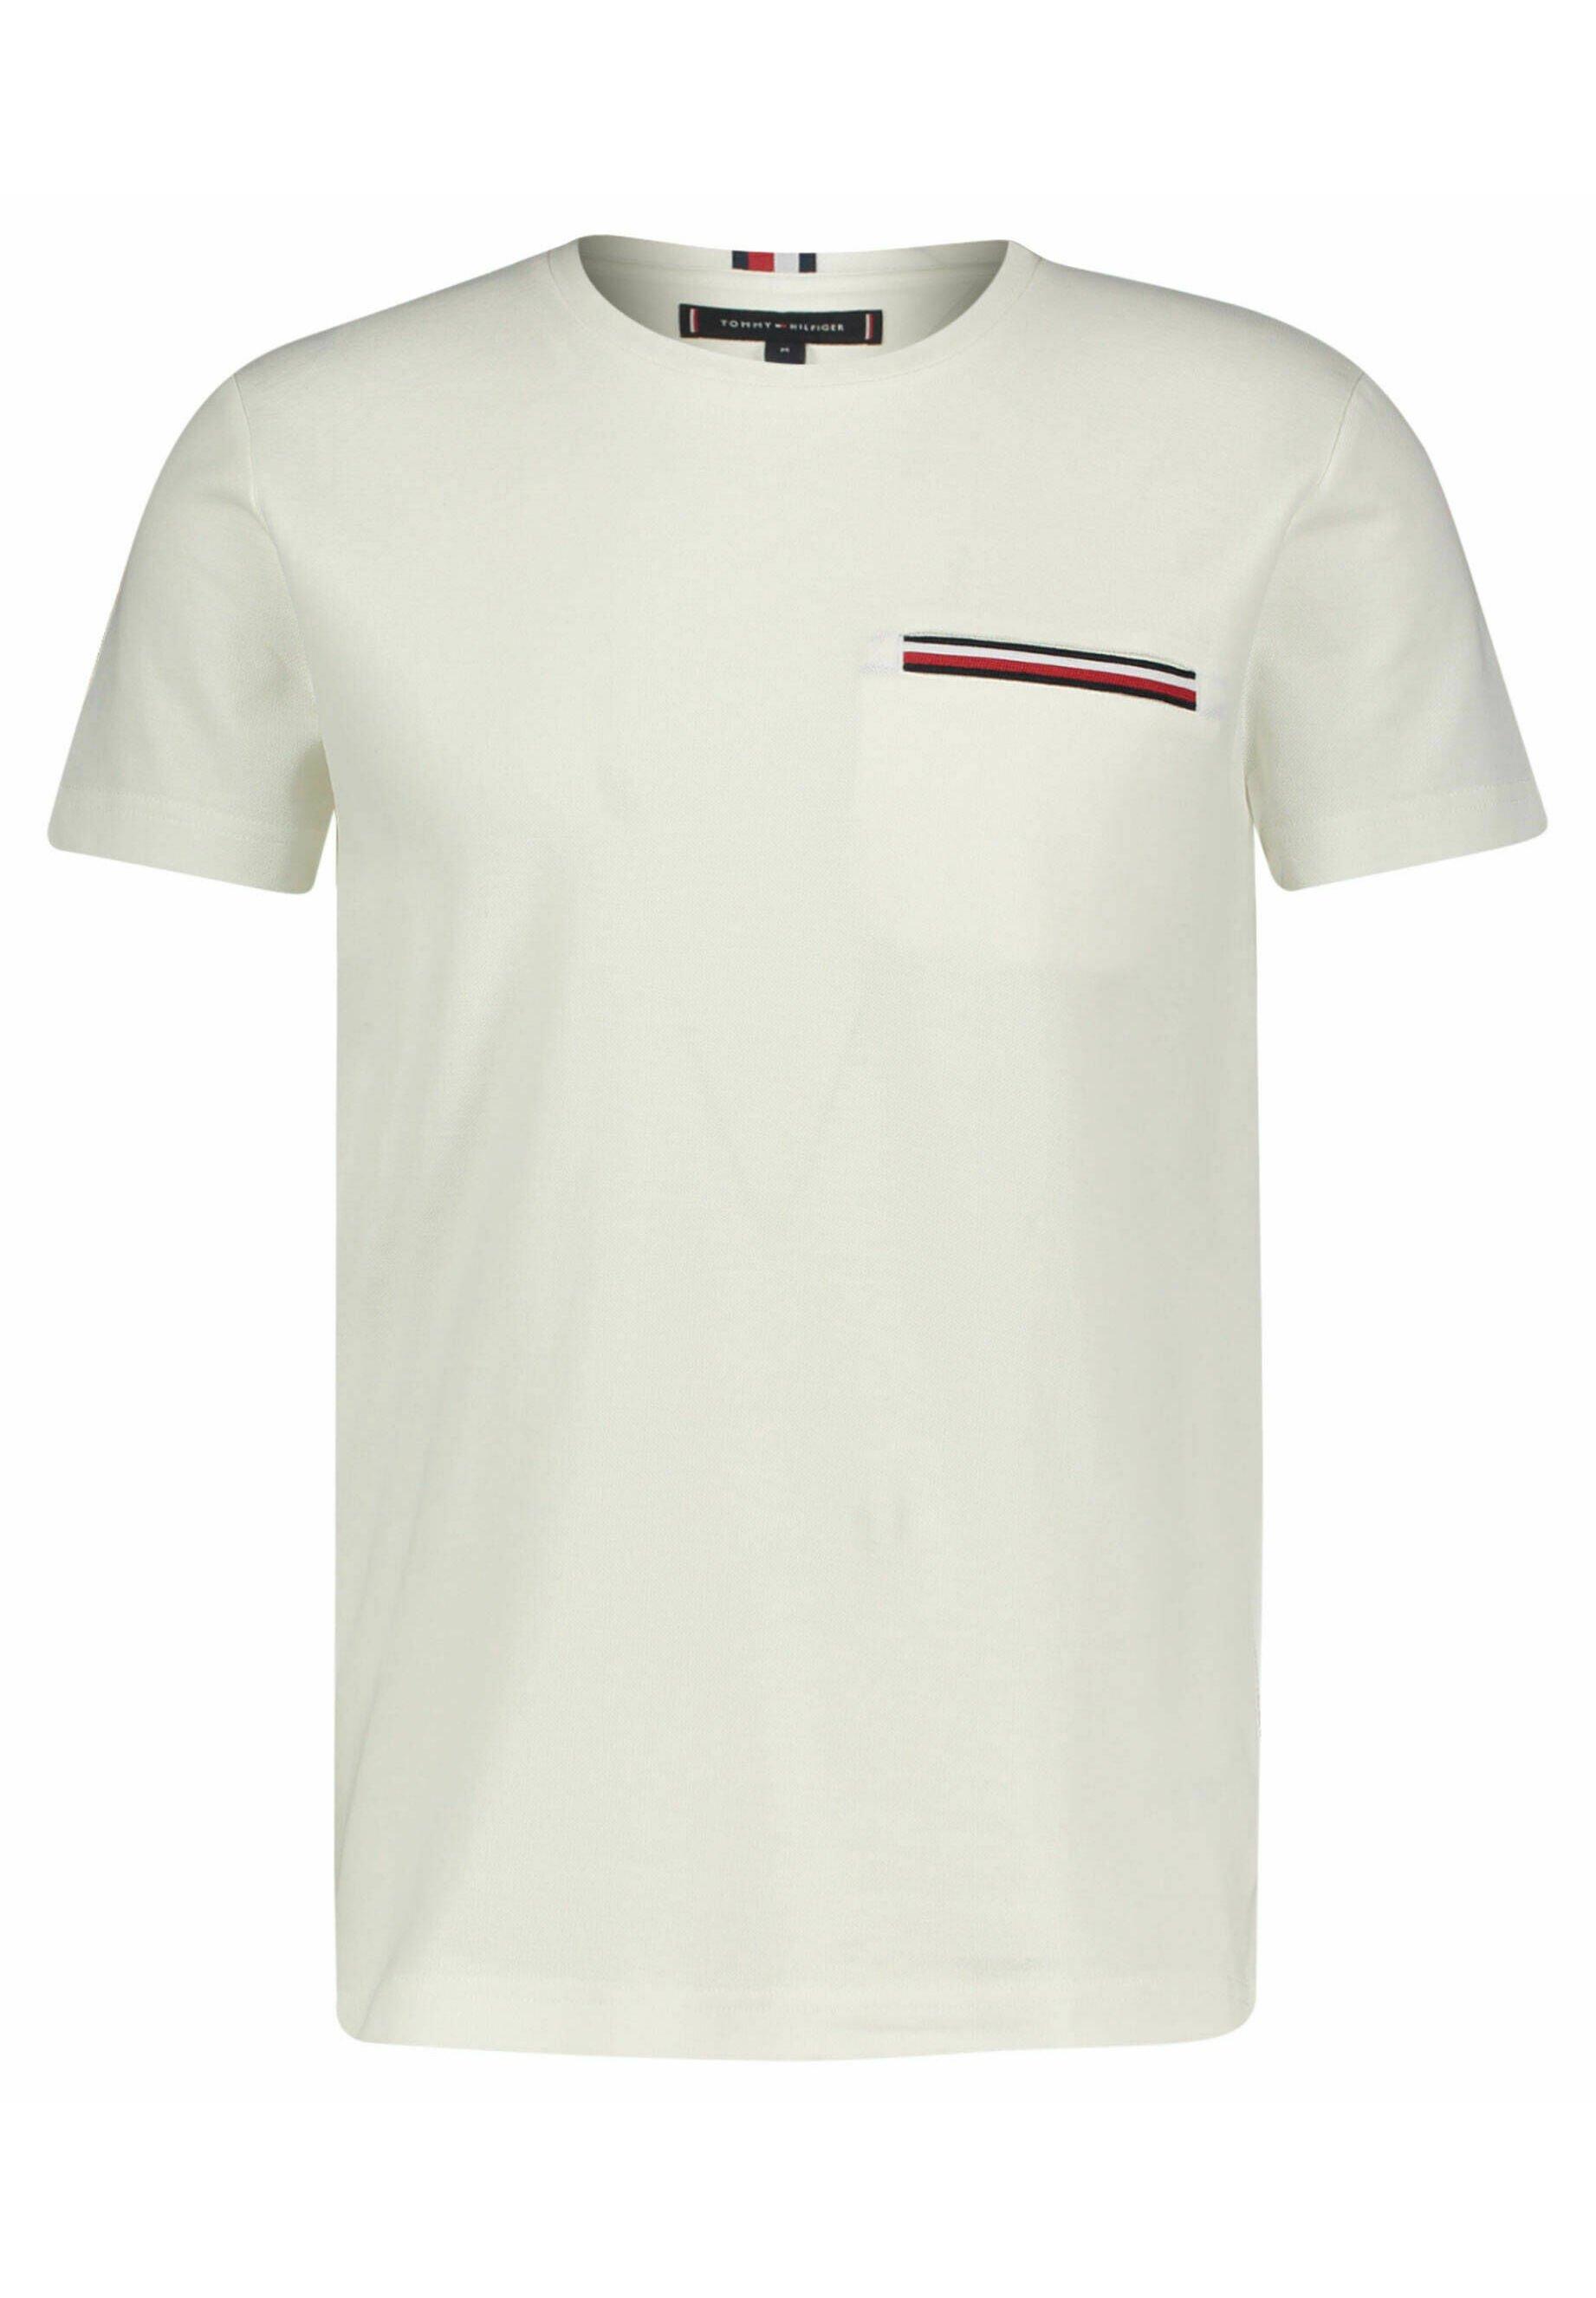 Homme TOMMY HILFIGER HERREN T SHIRT - T-shirt basique